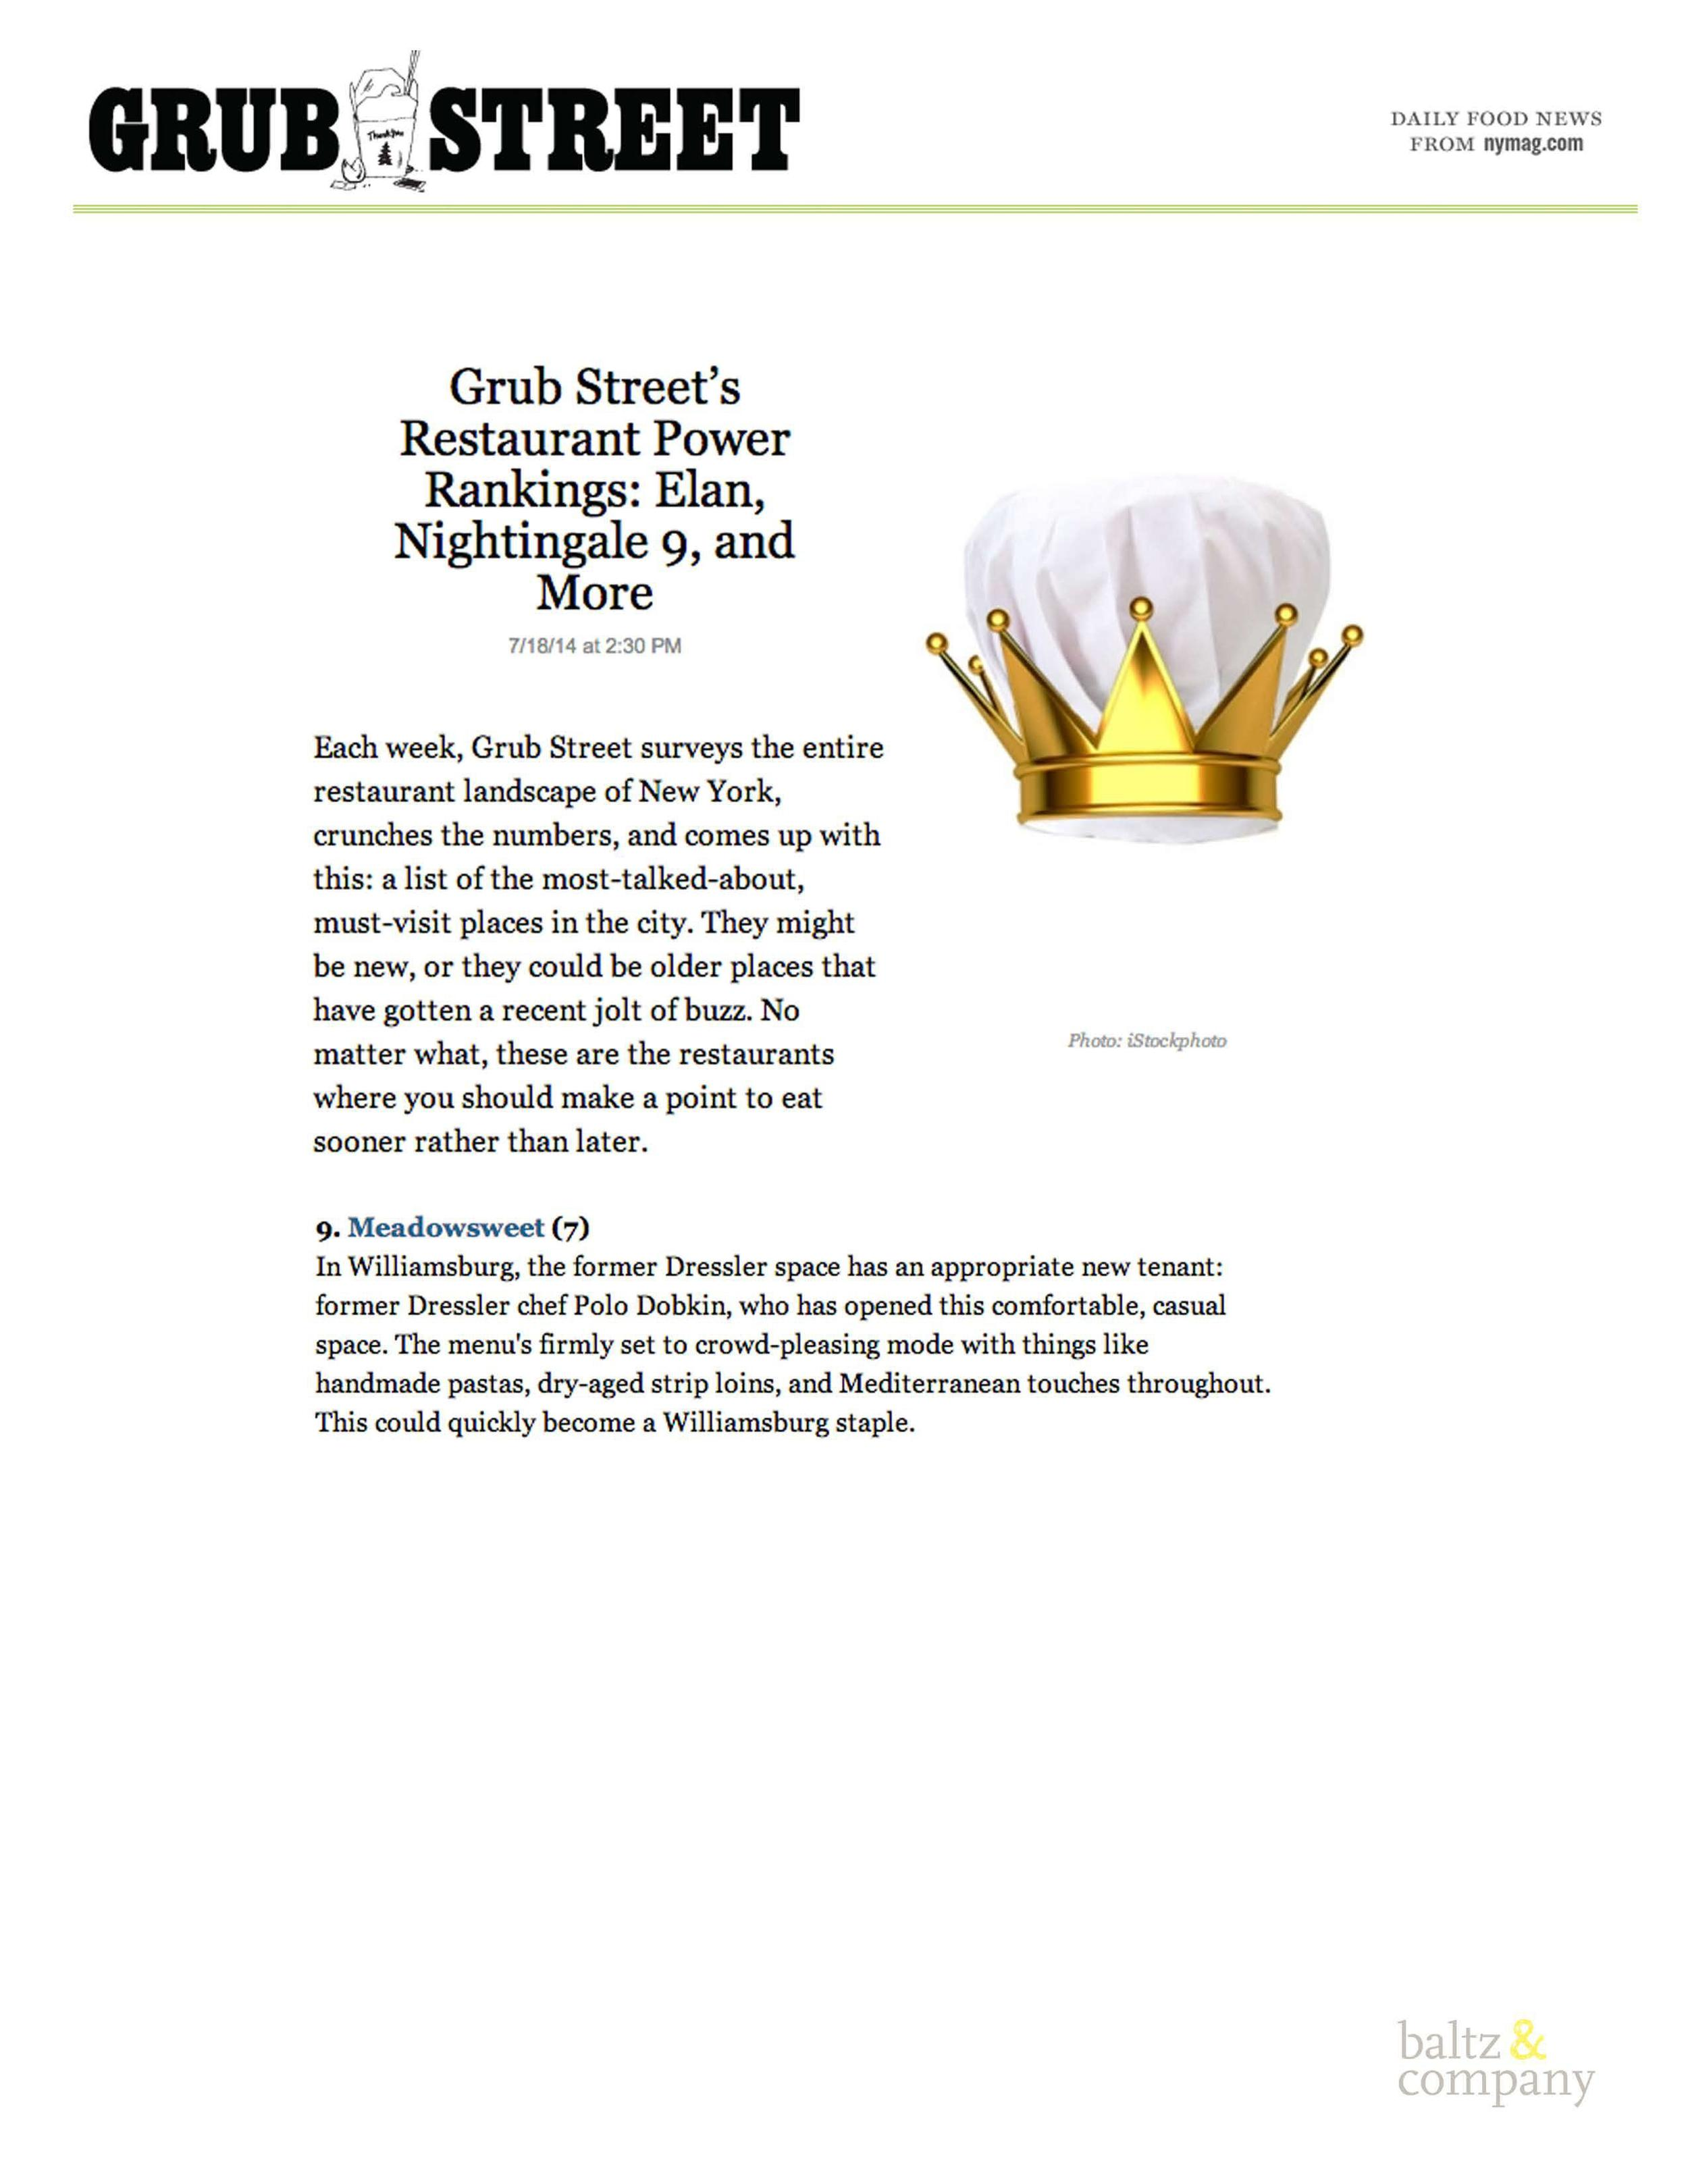 GrubStreet-5.jpg